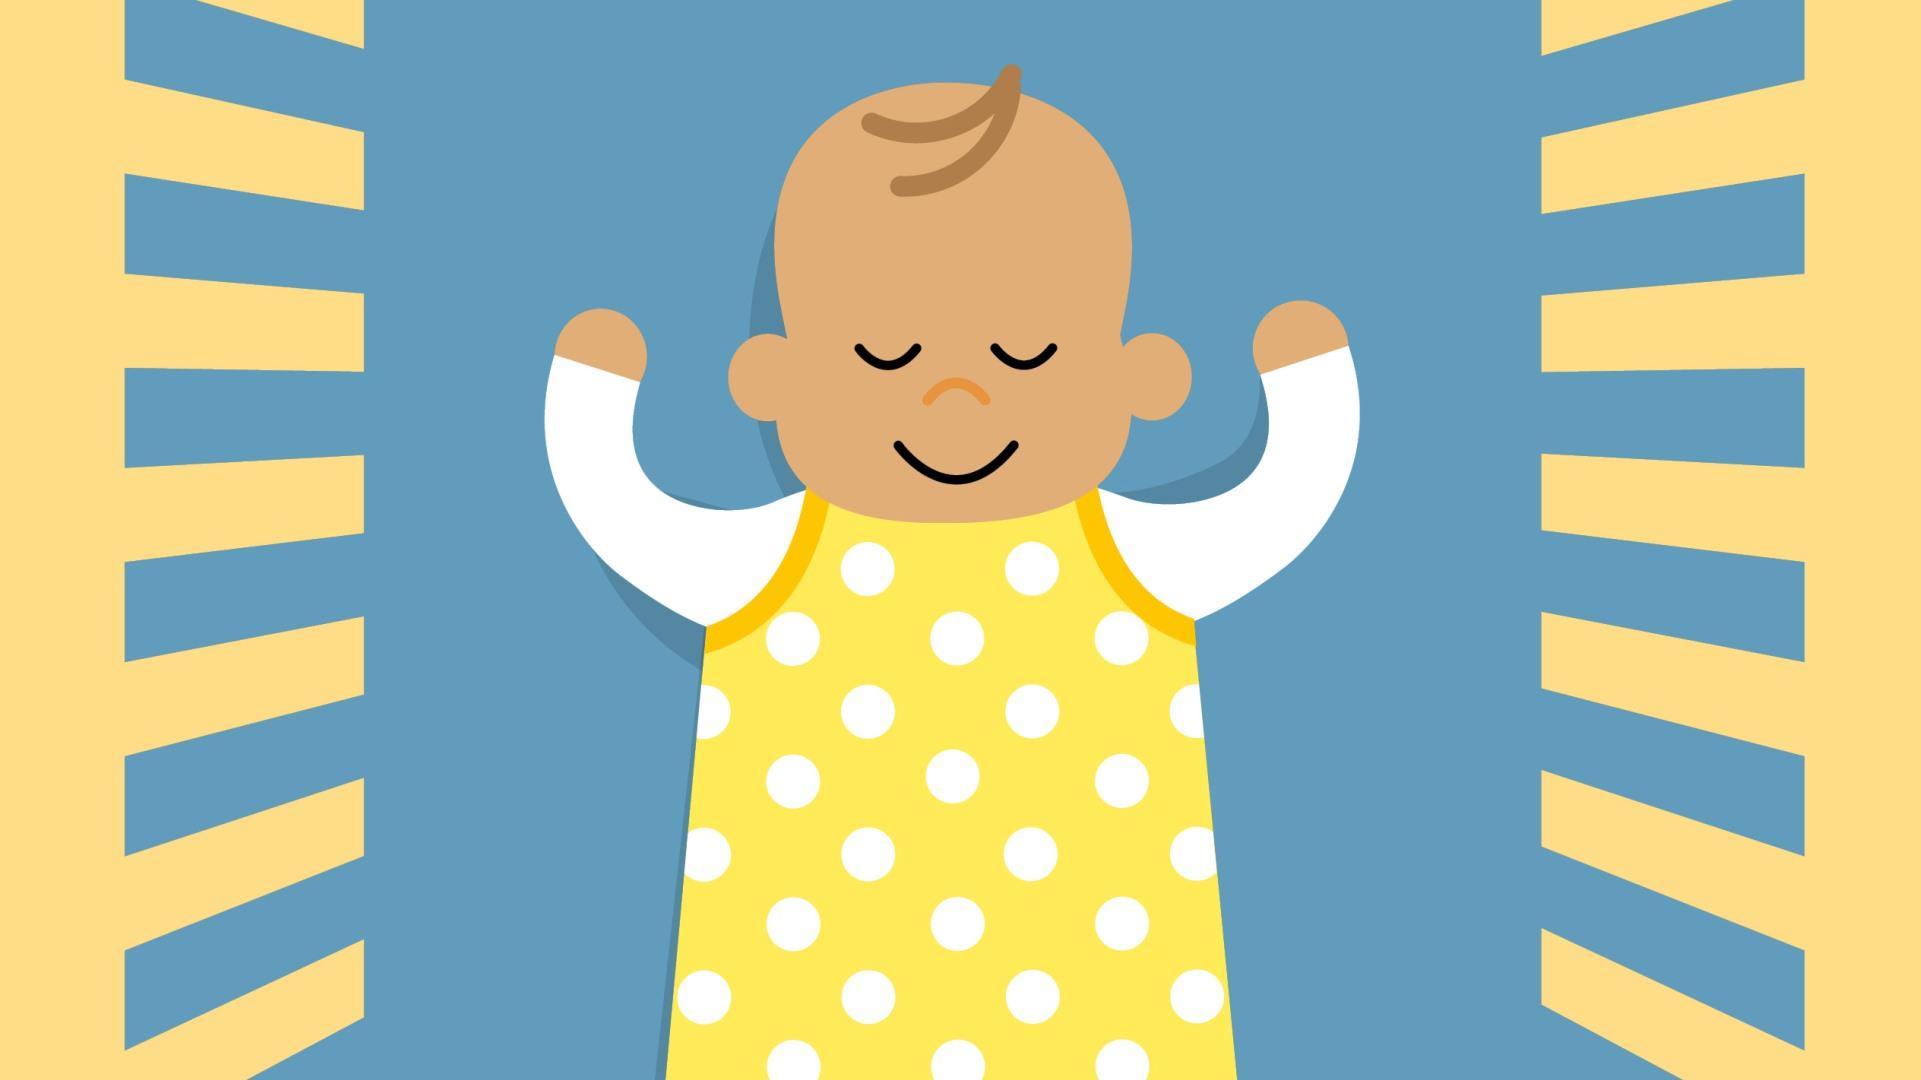 Baby Sleeping Clipart at GetDrawings.com.